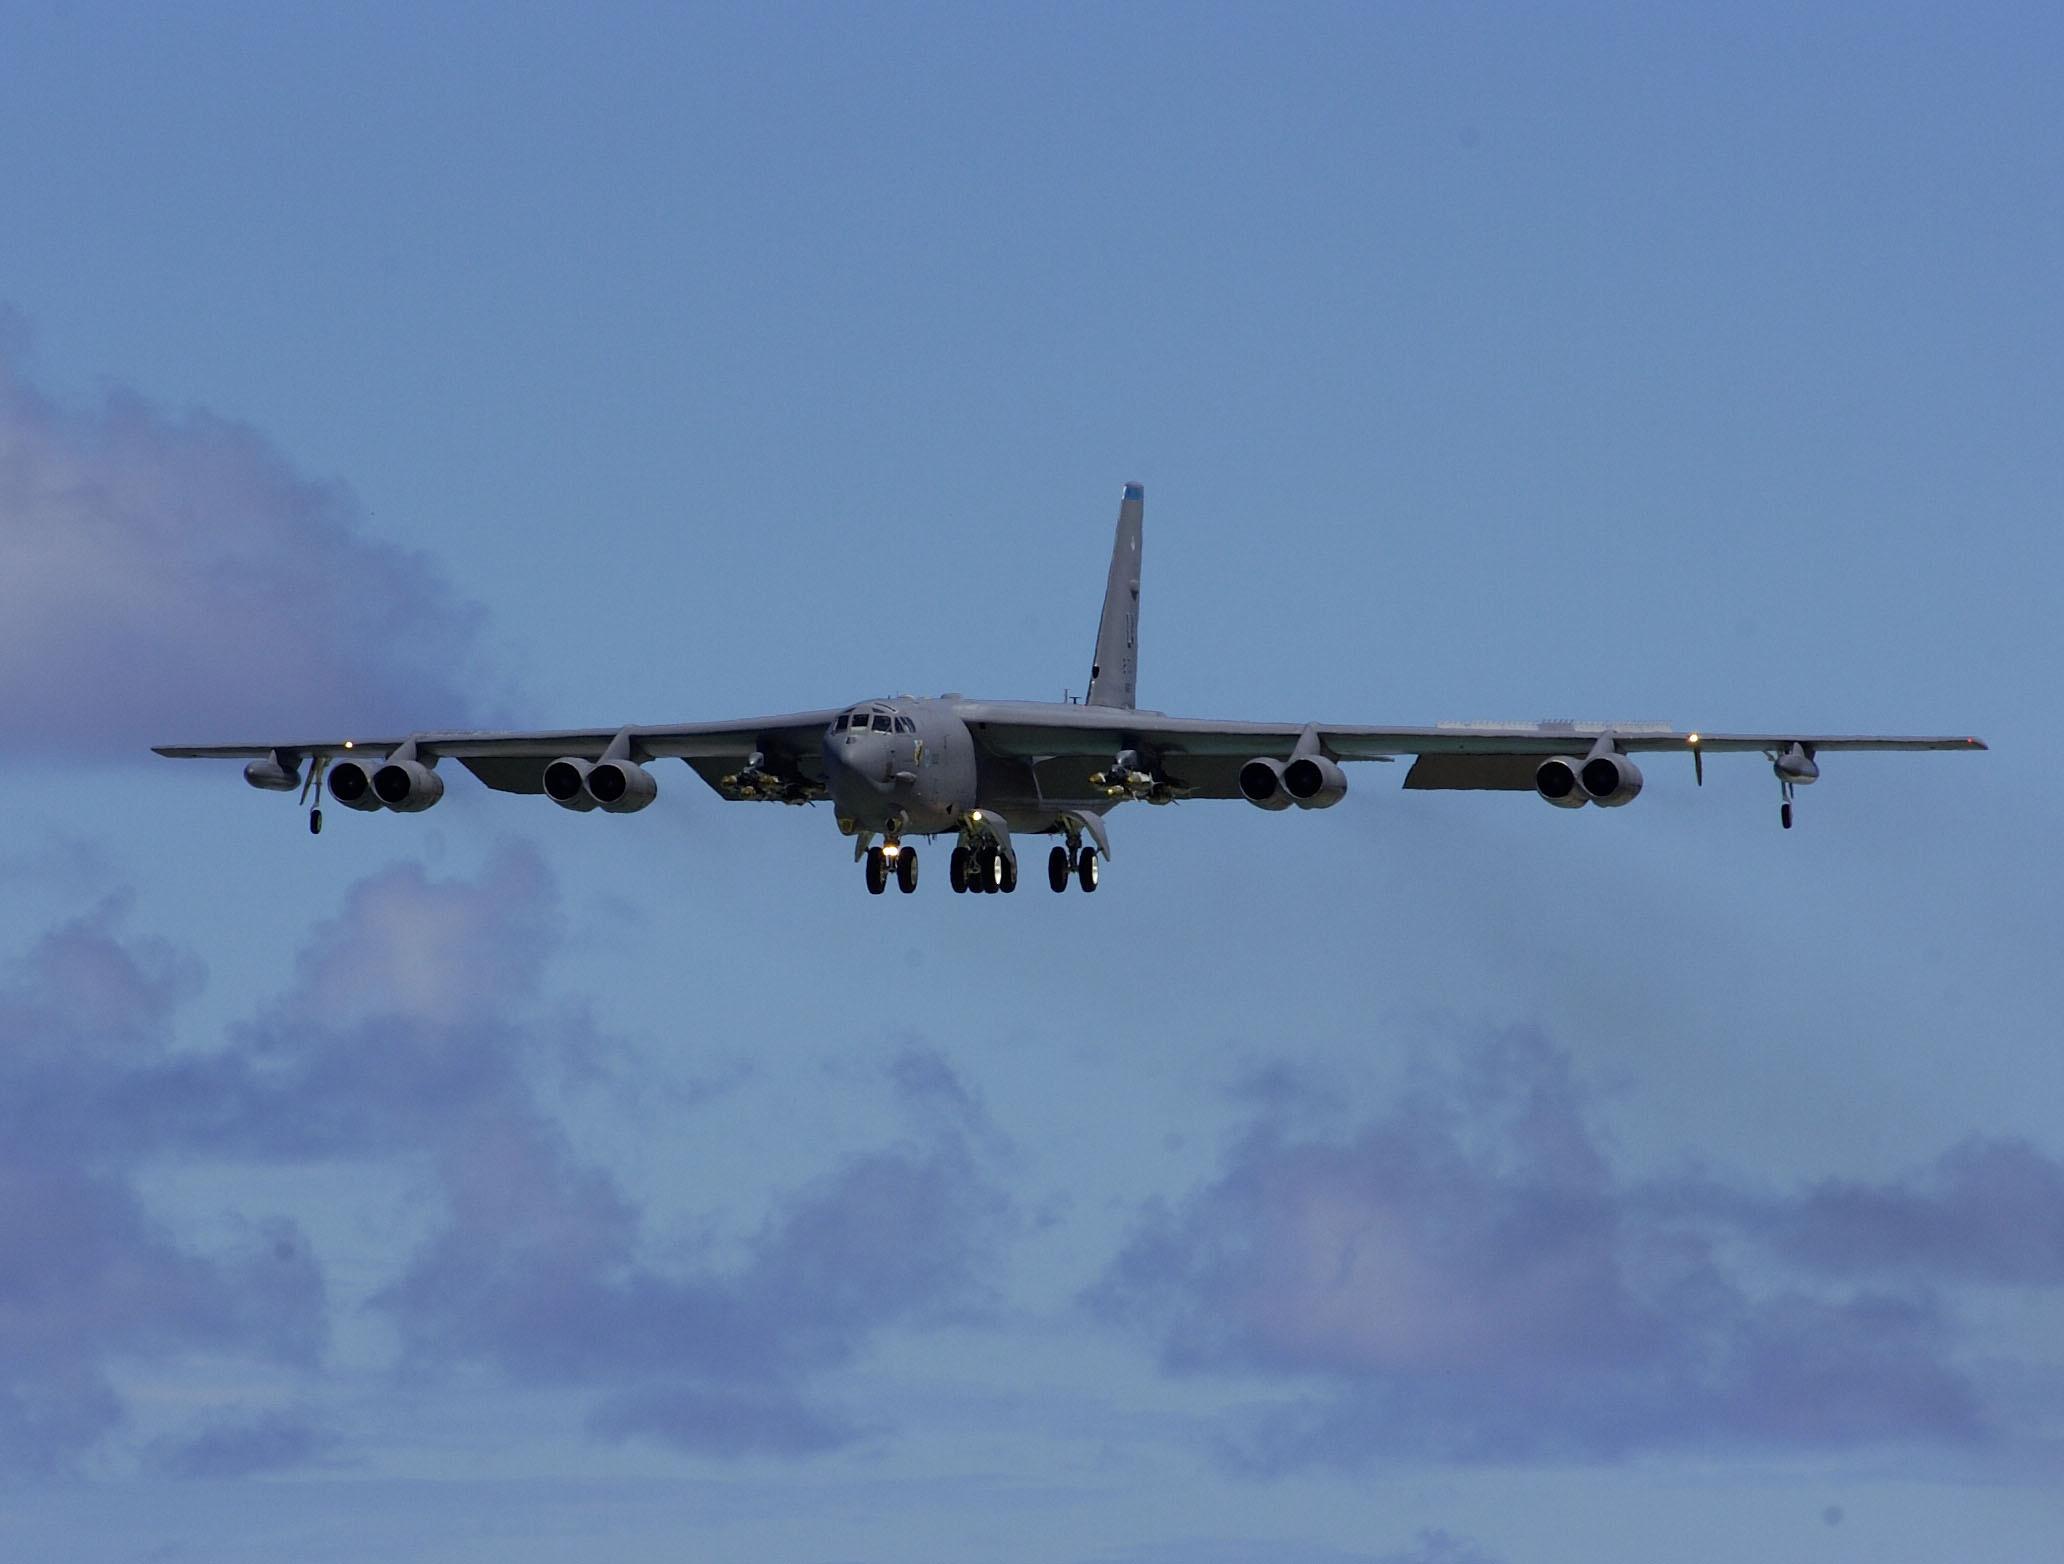 File:B-52 Stratofortress landing.jpg - Wikipedia